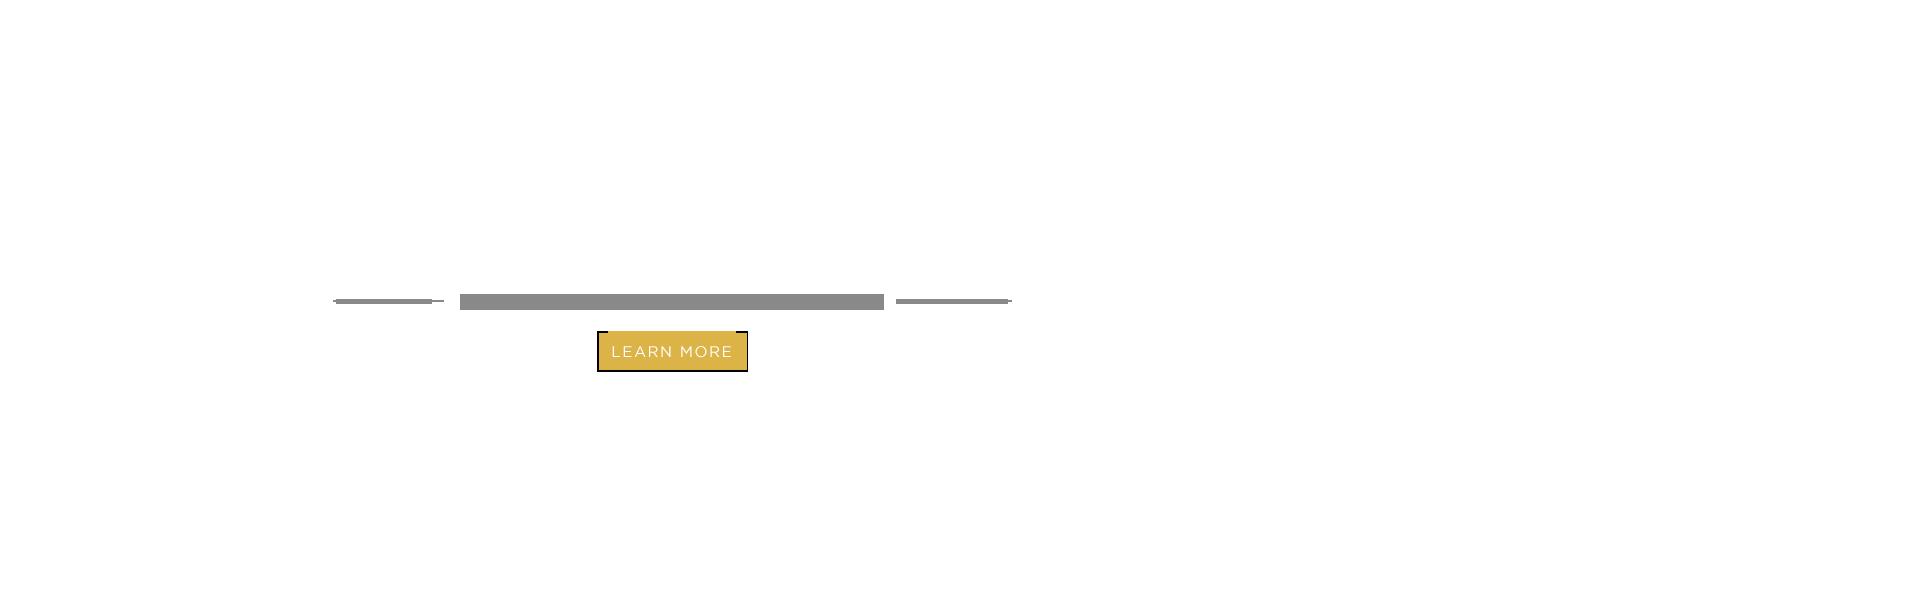 home page slider image background image